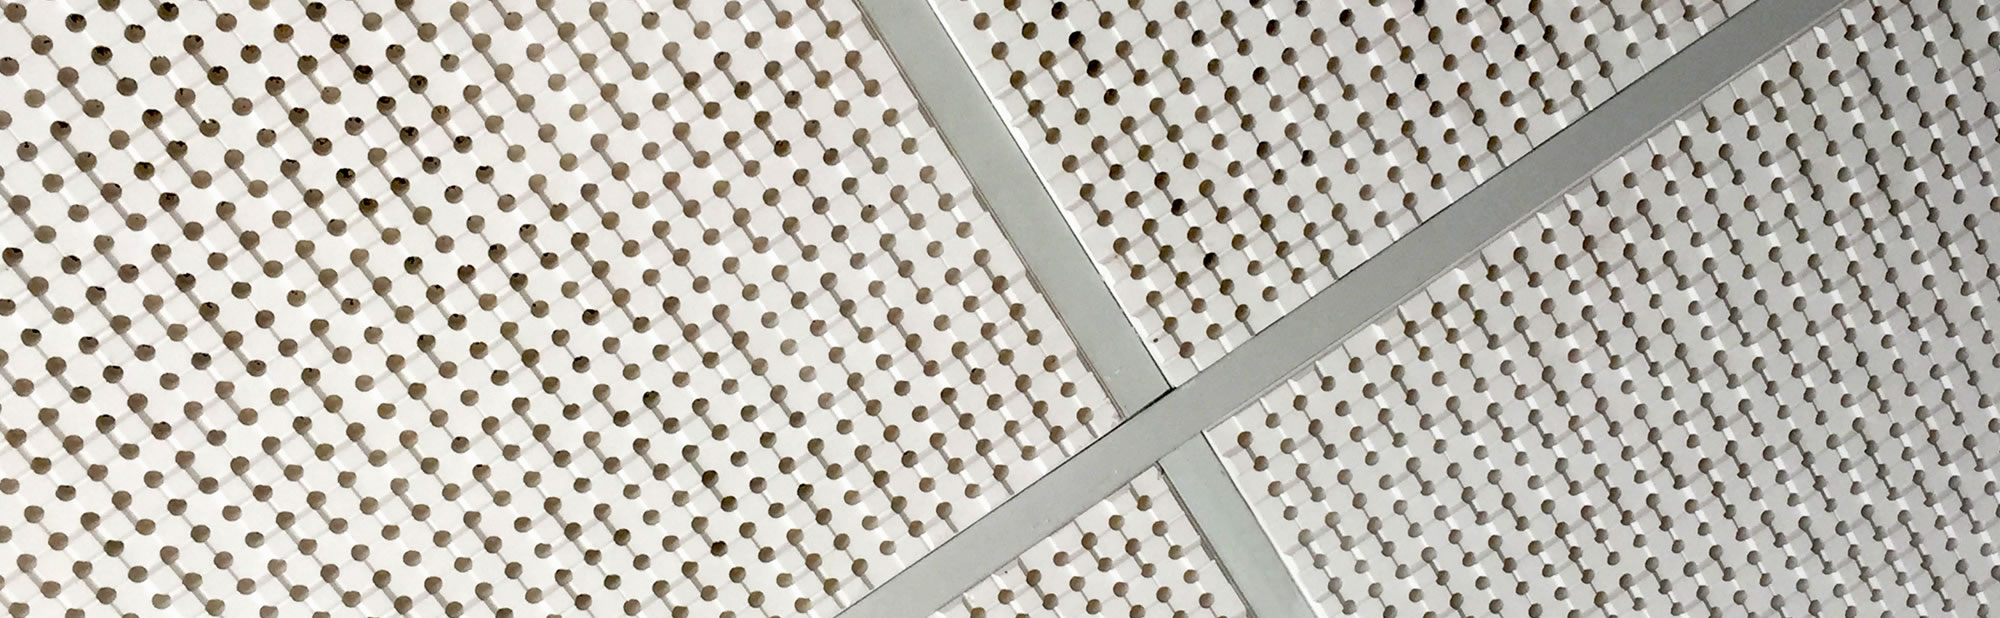 Nu shadex acoustic ceiling tiles australian plaster acoustics acoustic ceiling tile shadex dailygadgetfo Gallery